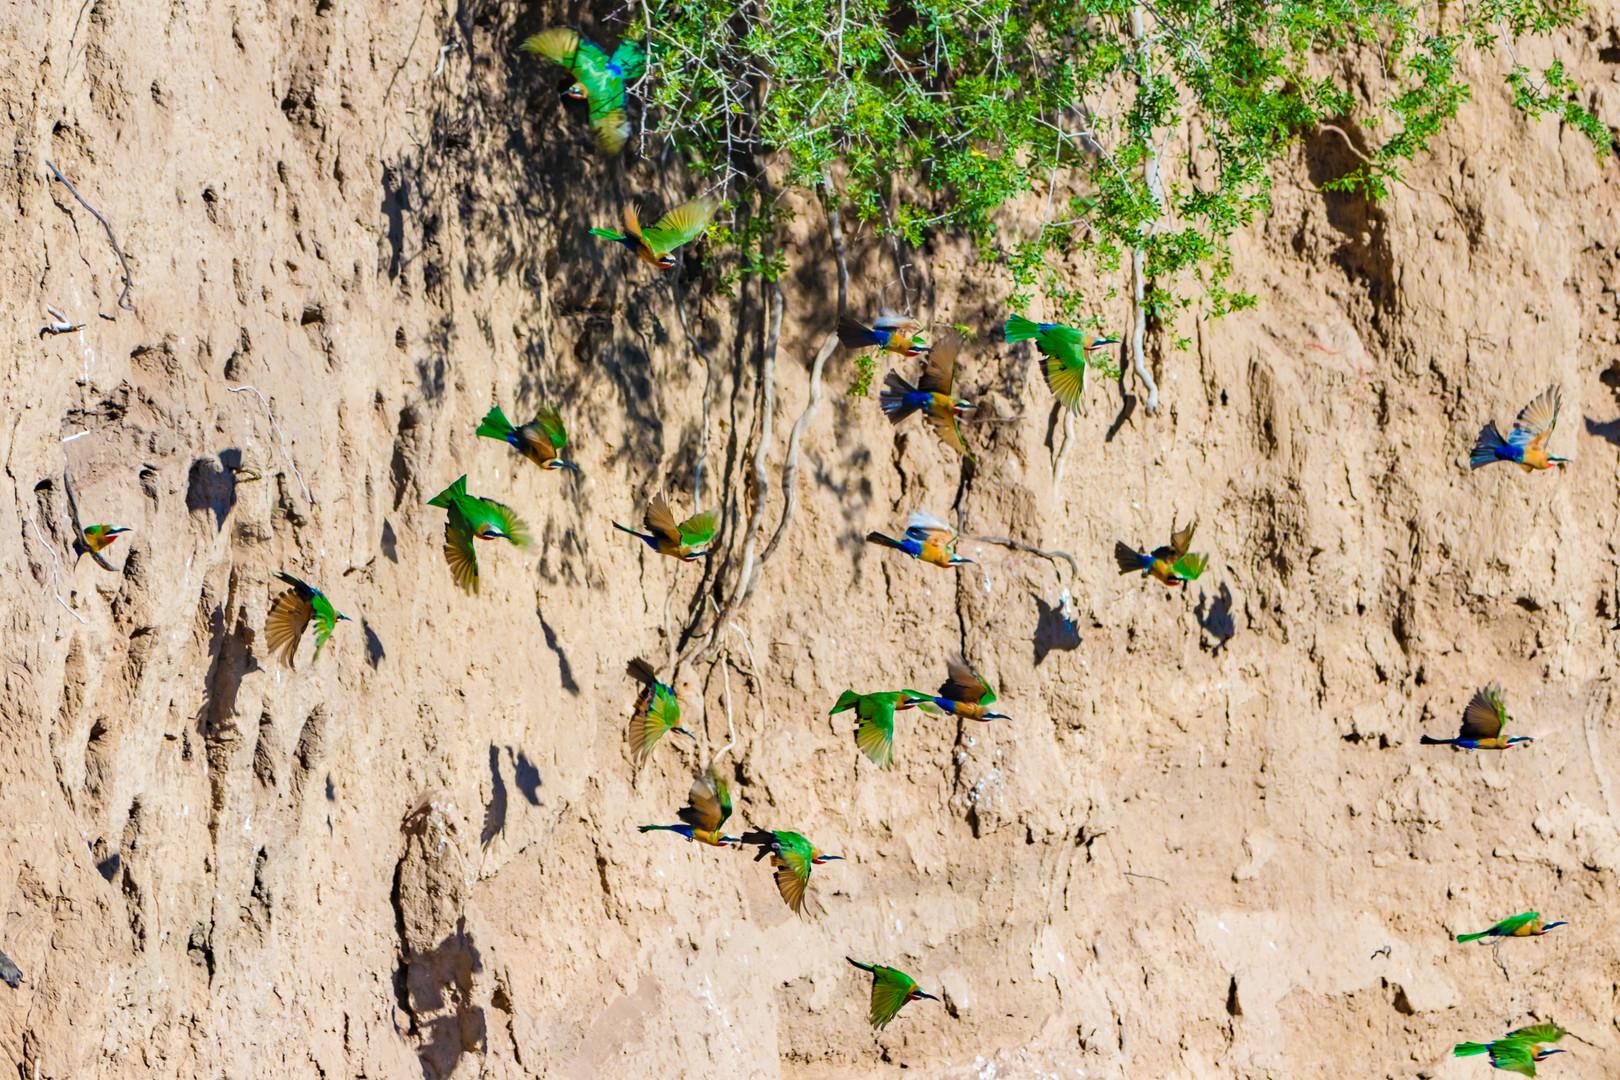 Birdwatching-7.jpg